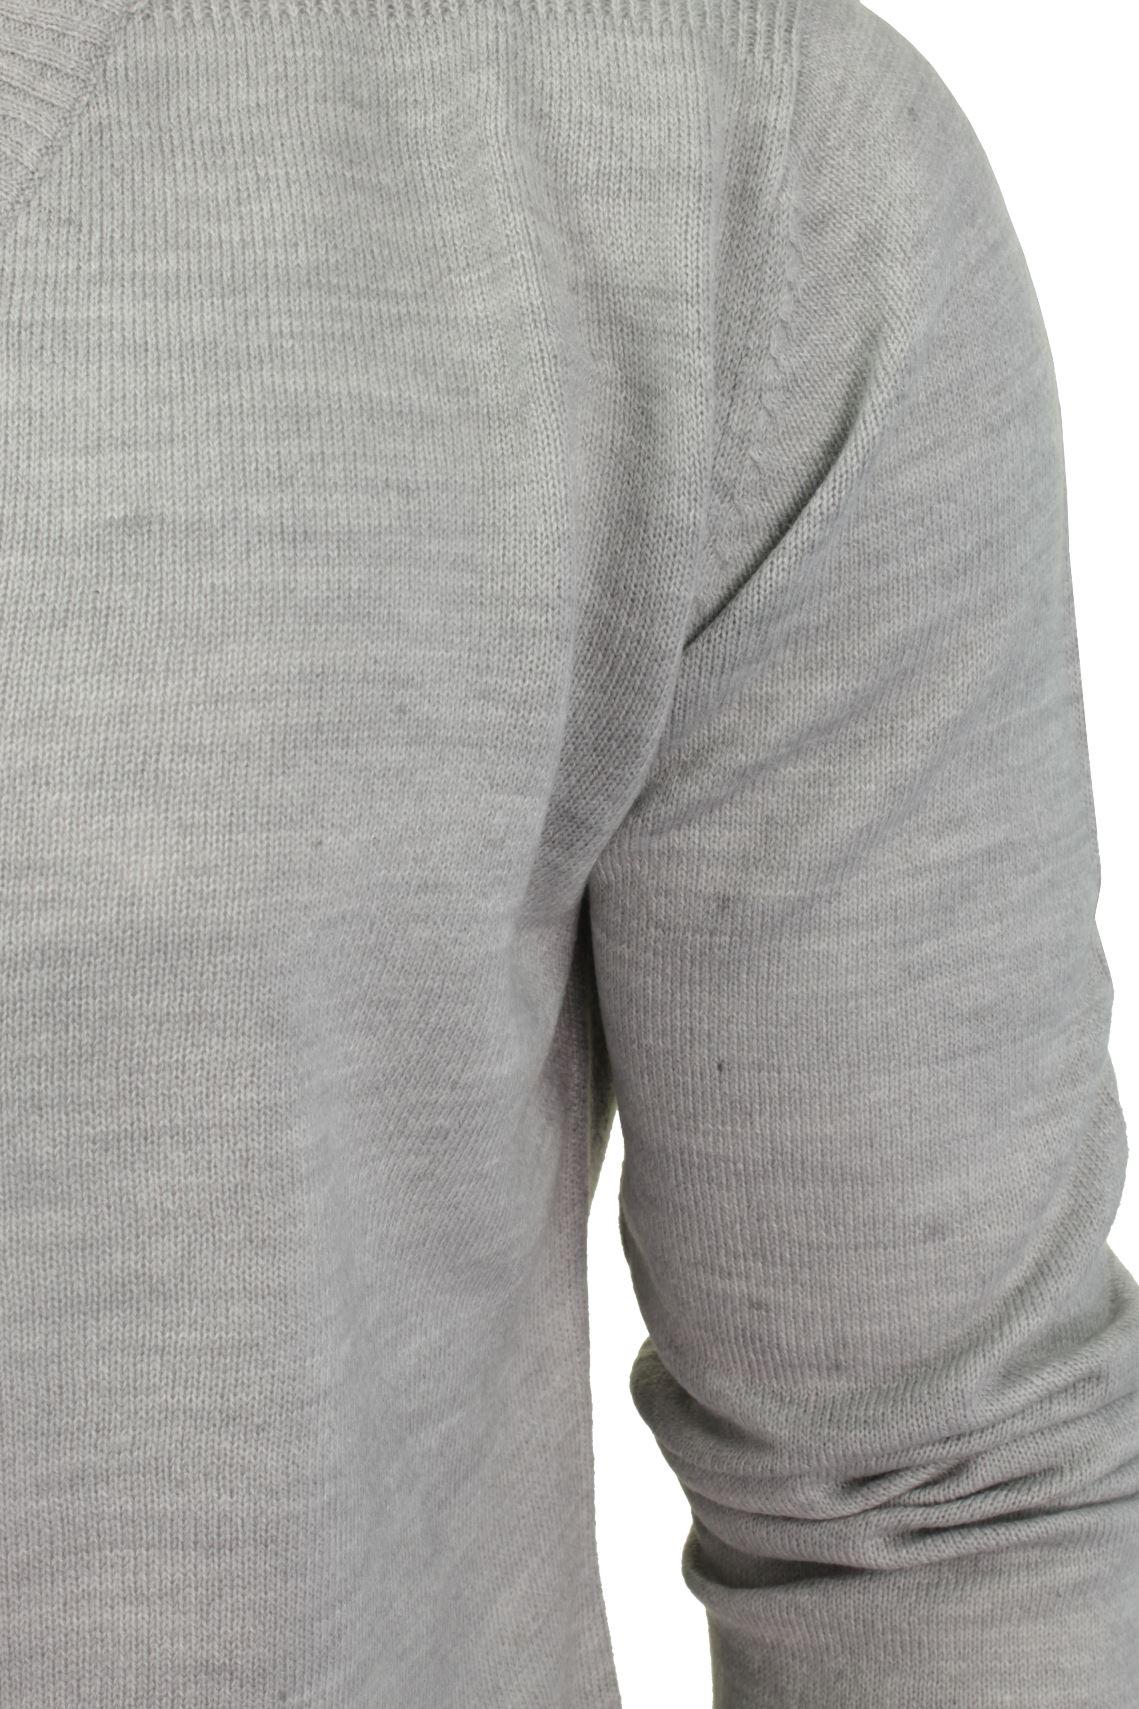 Xact-039-Ghazali-039-Cardigan-boutonnes-Col-en-V-Homme